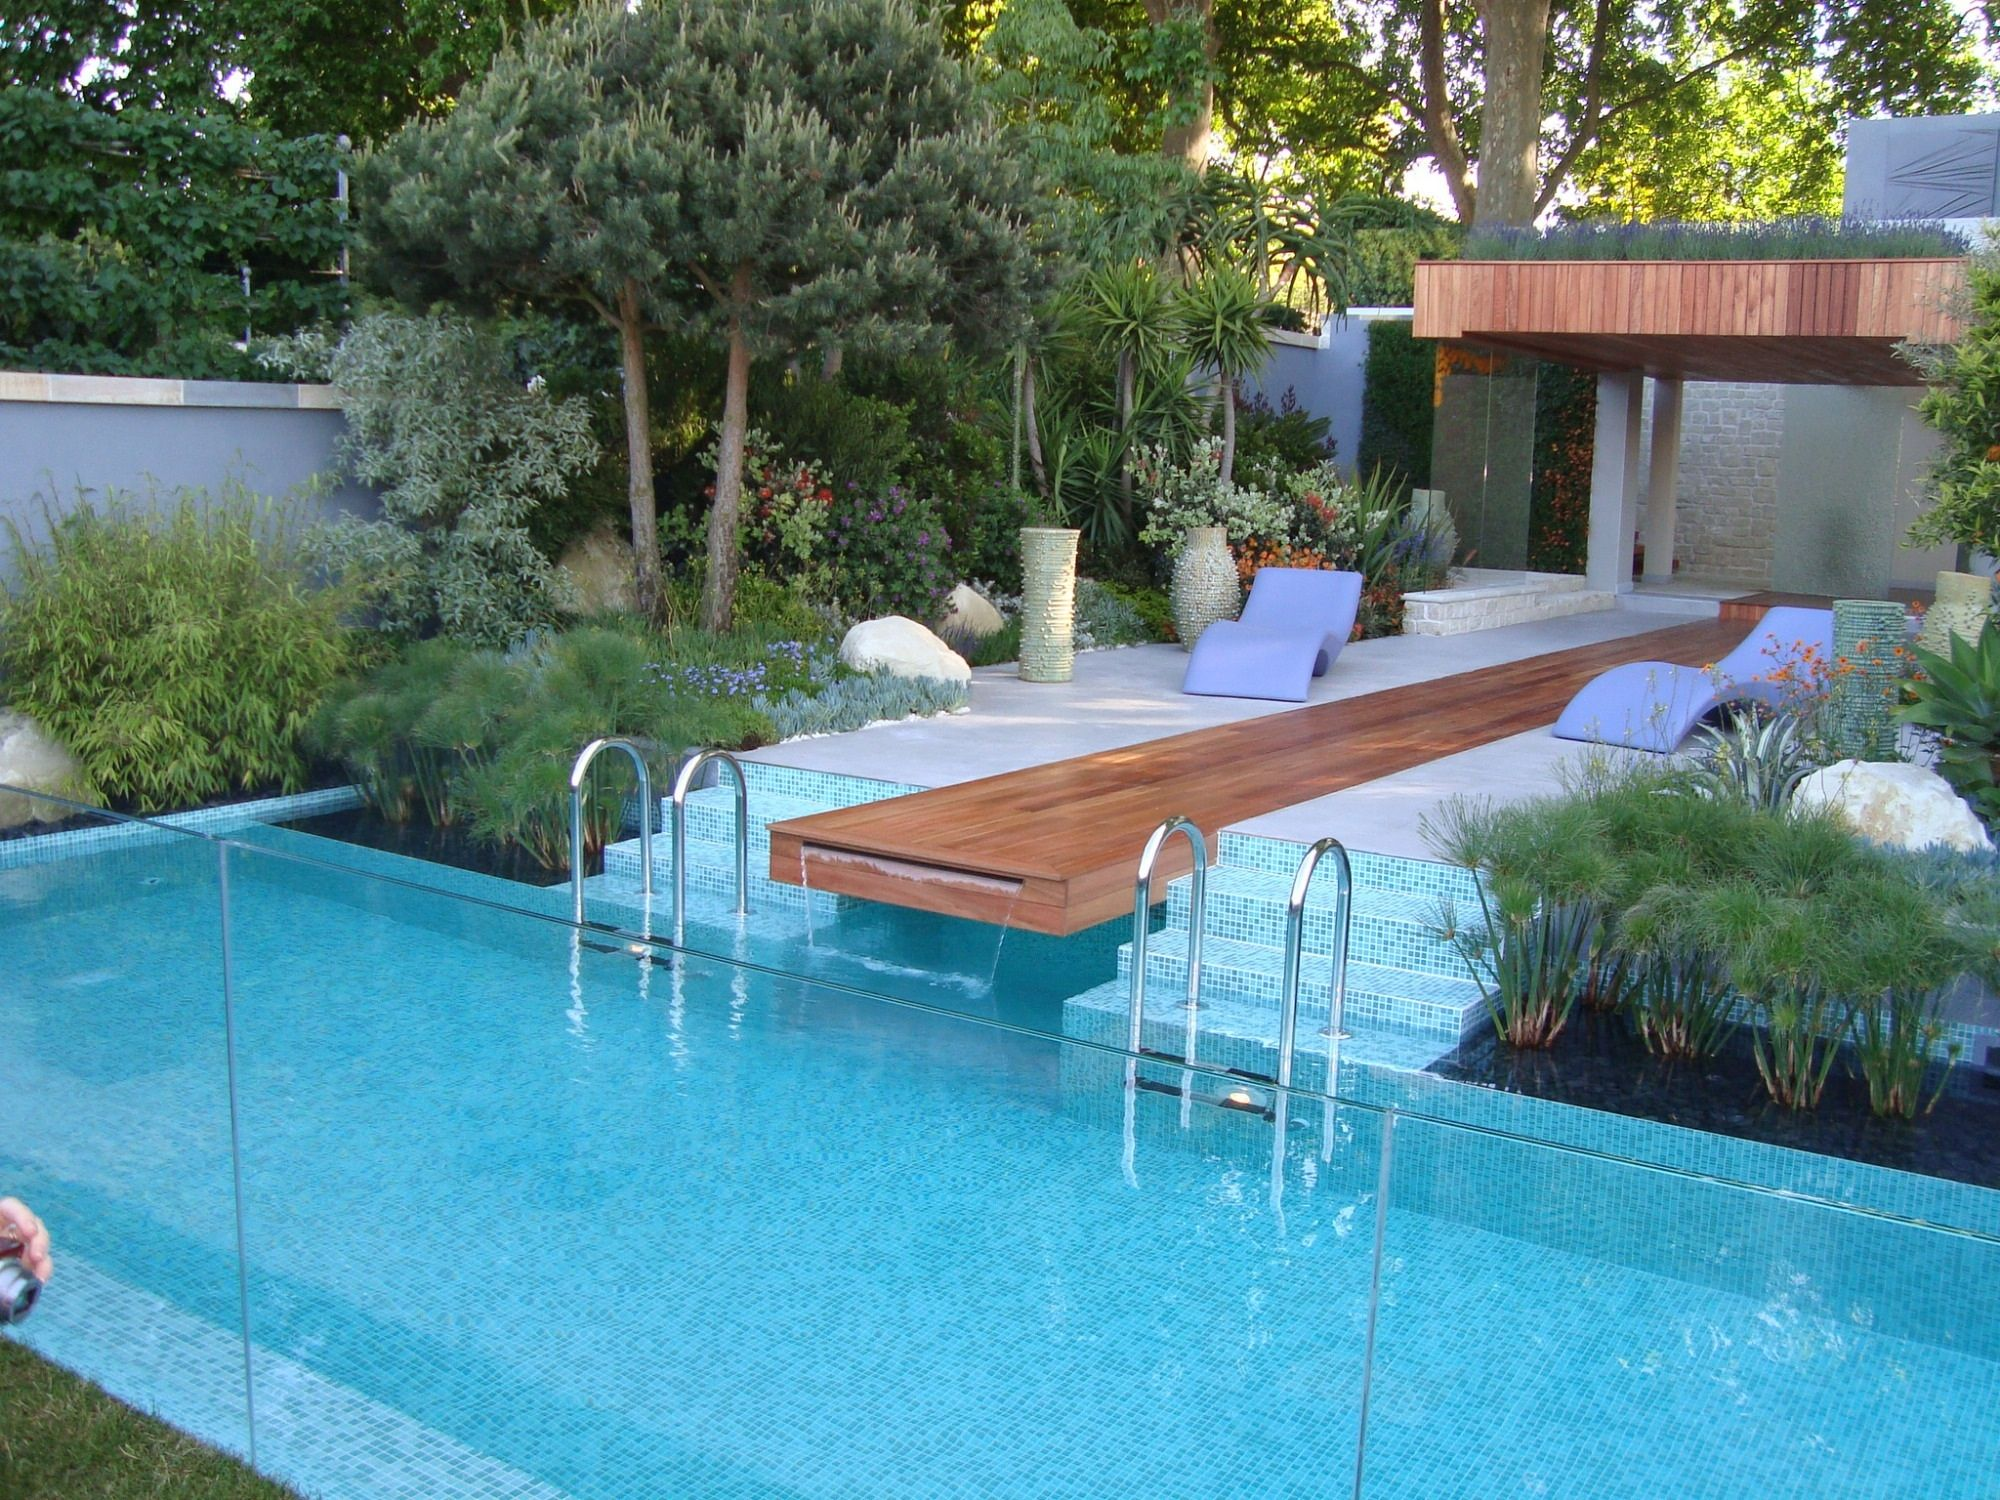 Monaco gardens Chelsea garden show Garden swimming pool